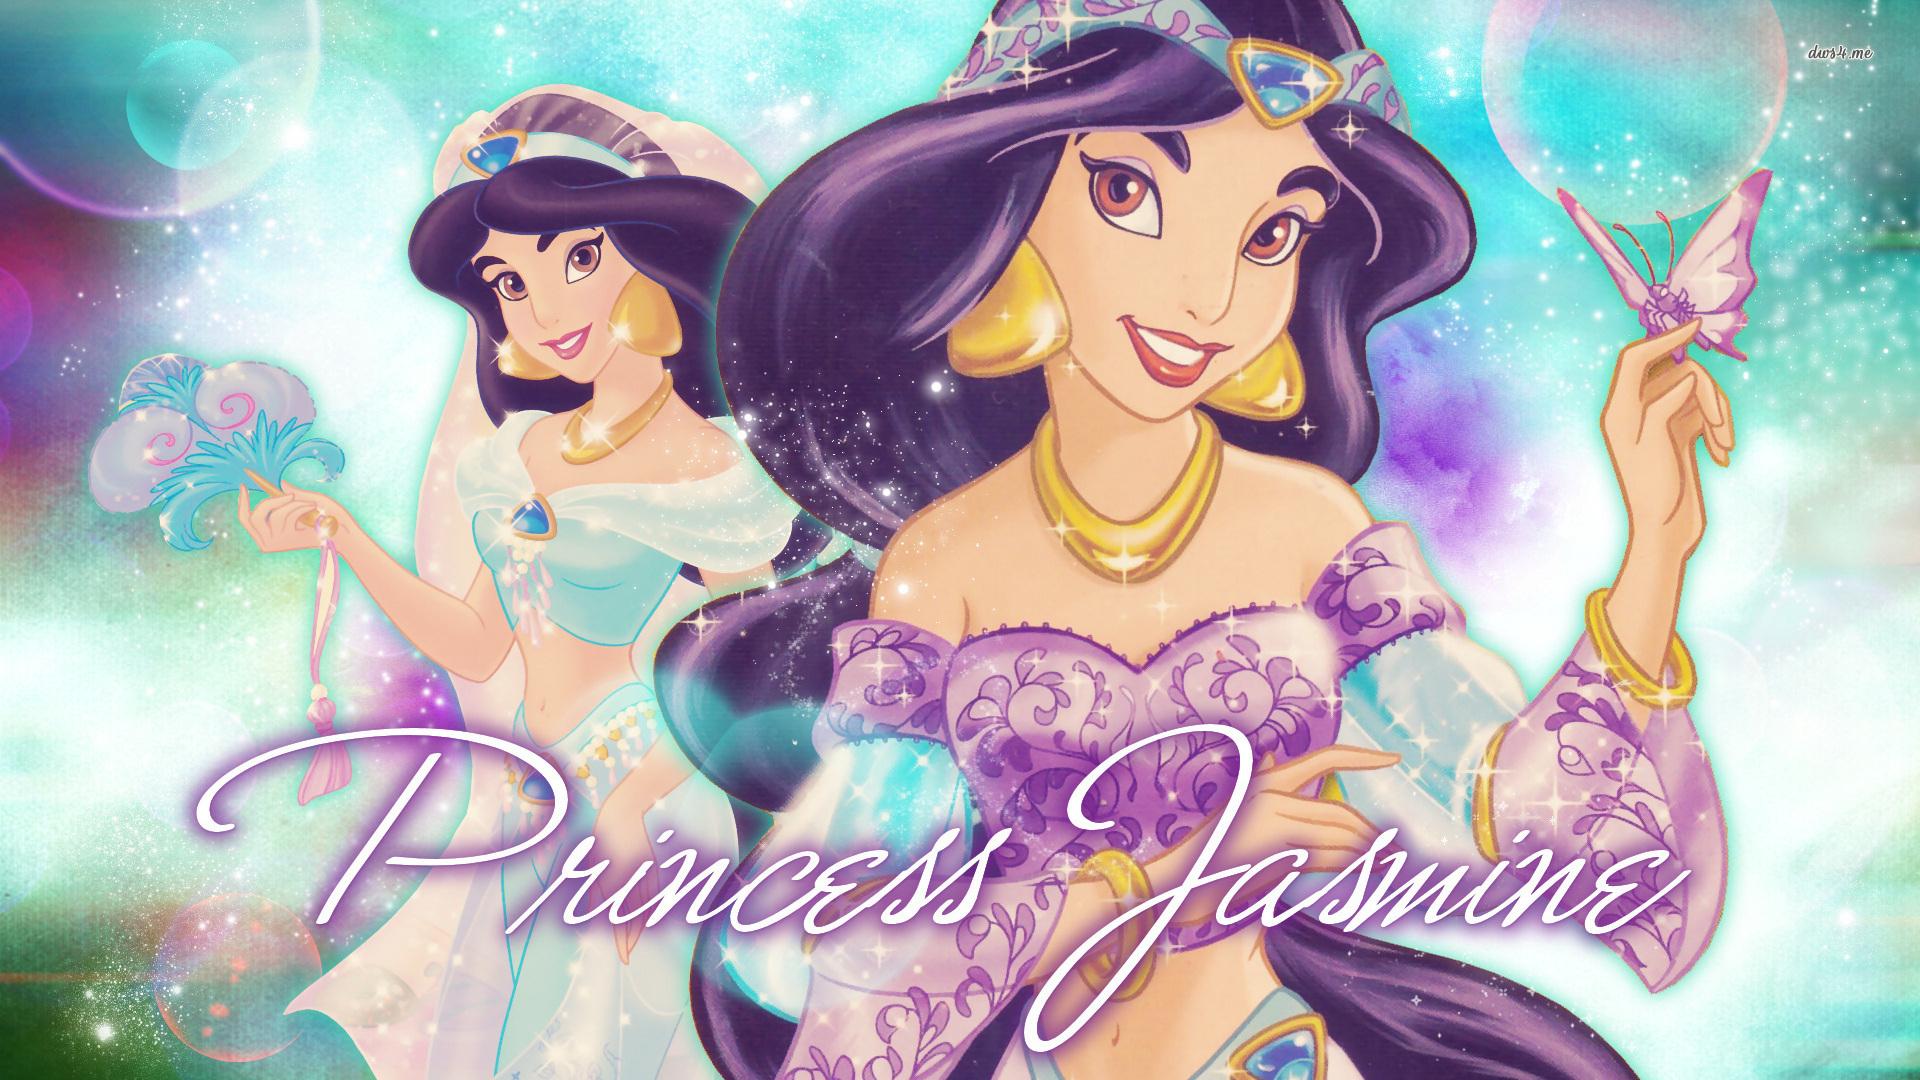 Jasmine Wallpaper Disney Love Wallpaper 38642889 Fanpop